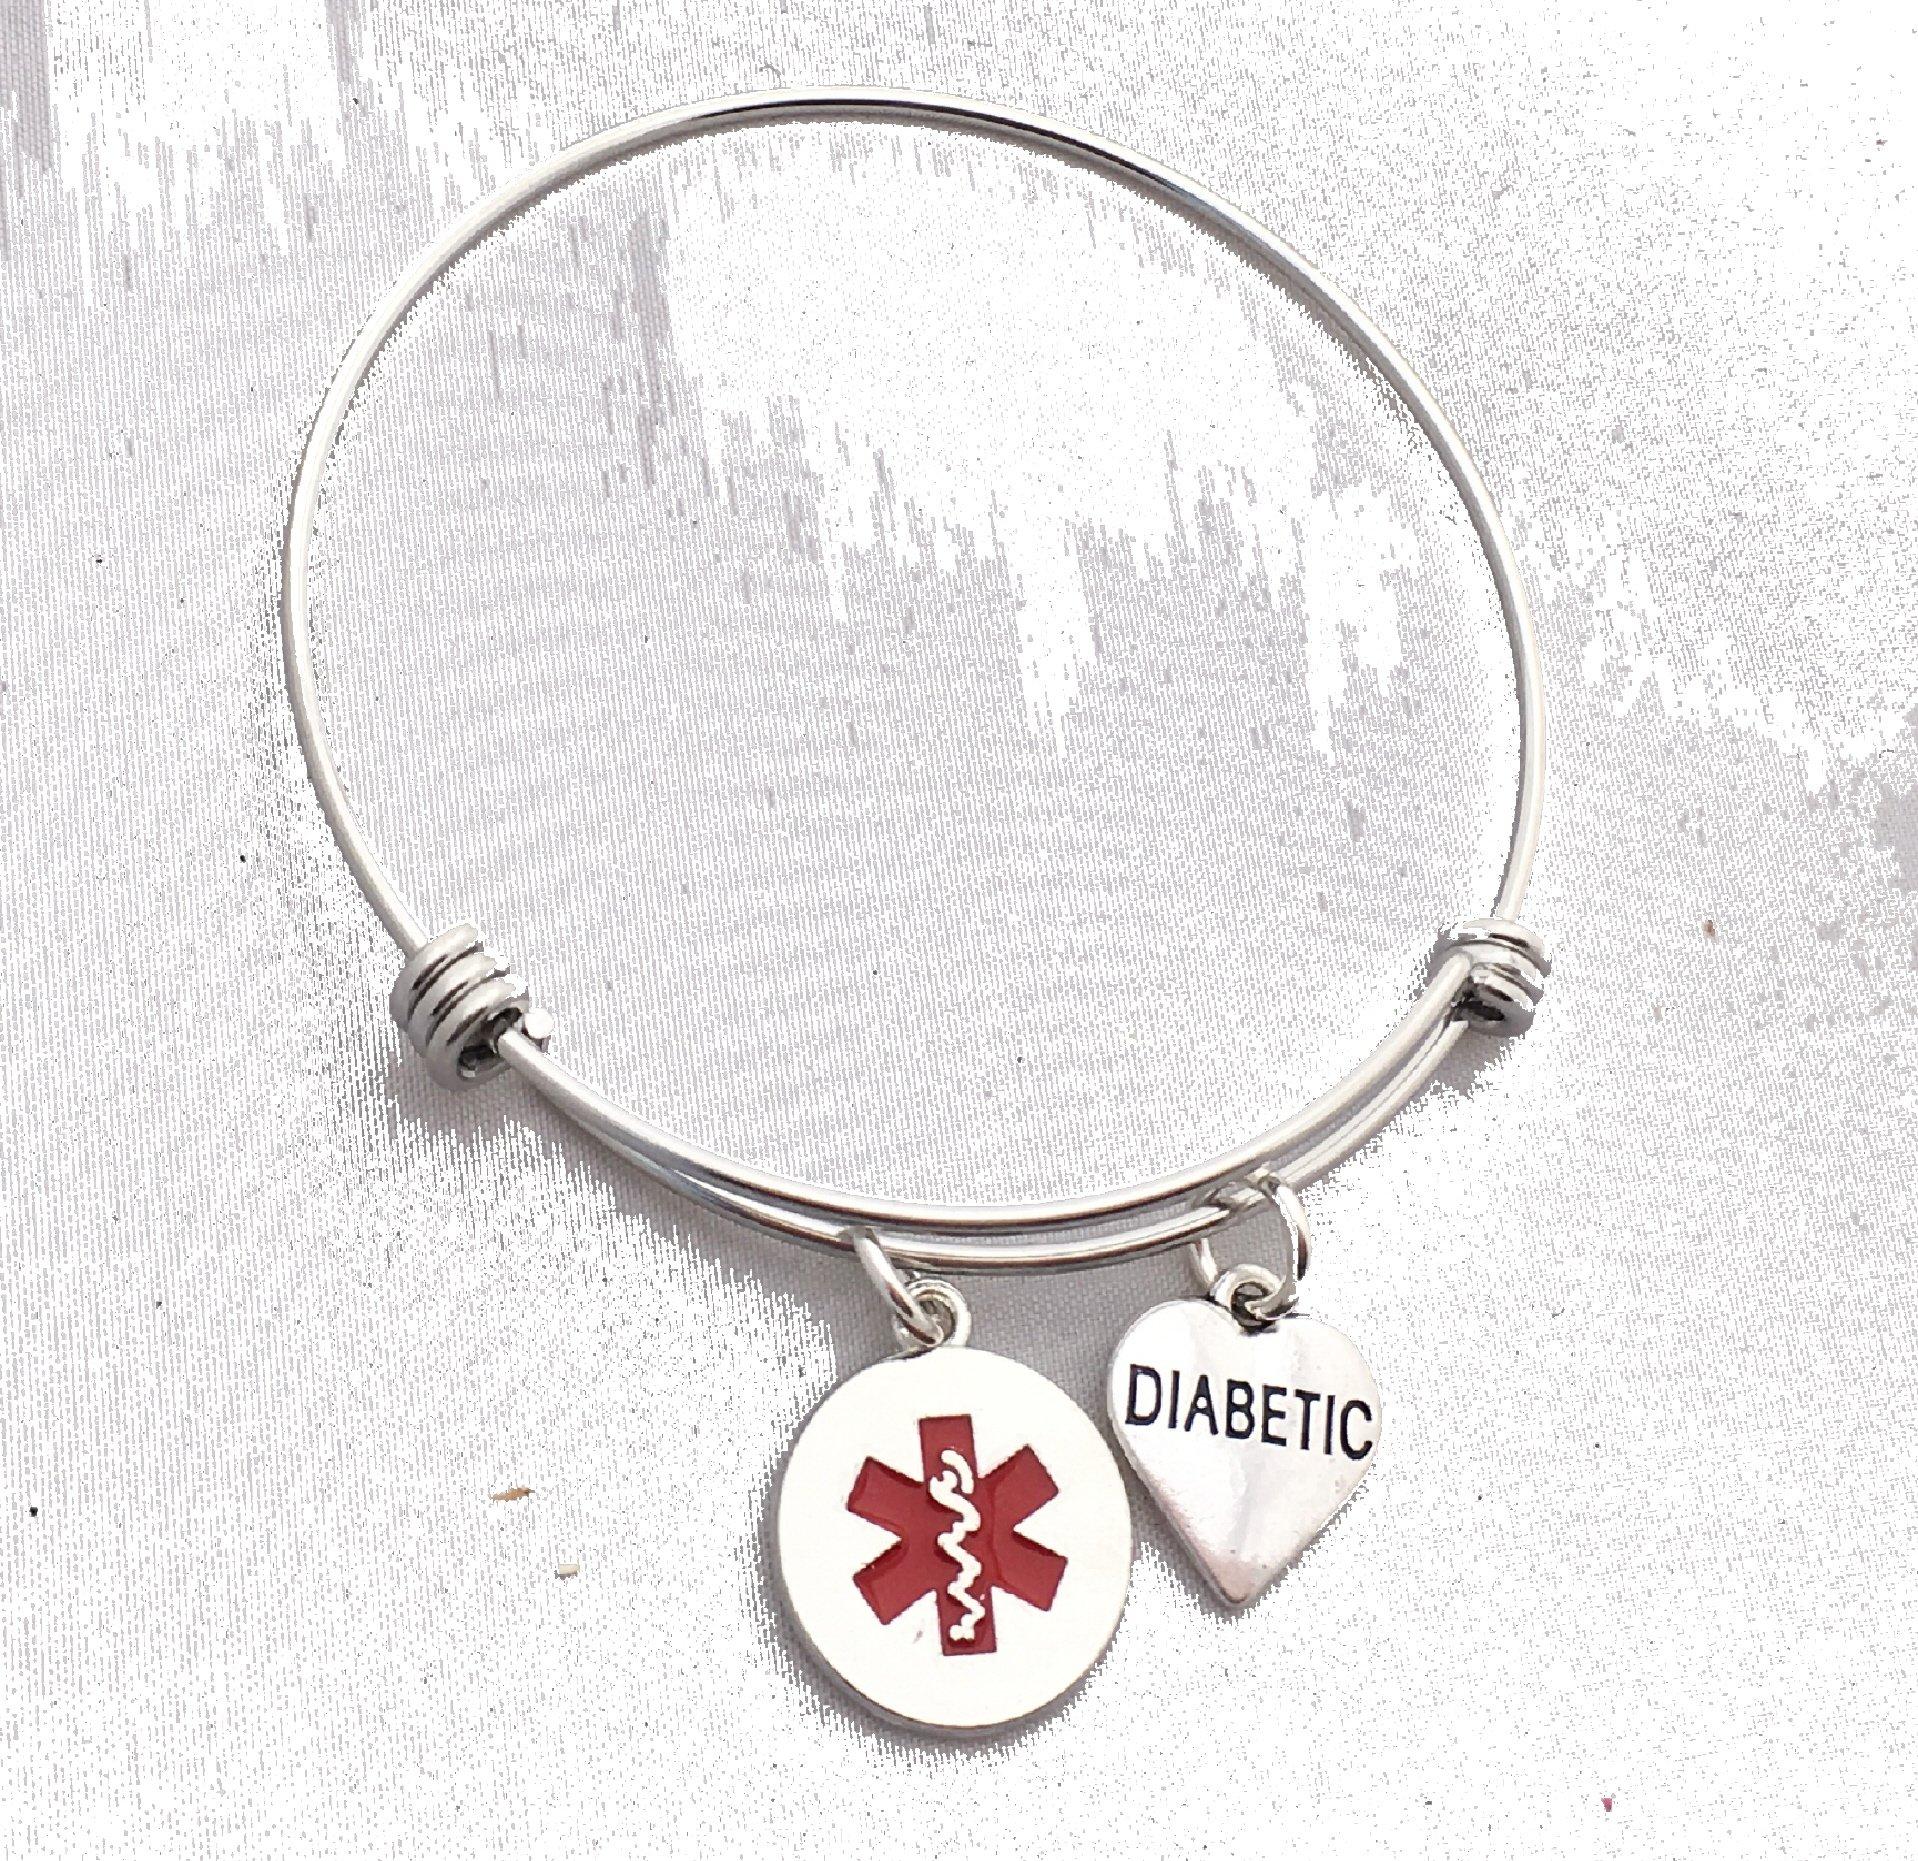 Diabetic Heart Medical Alert Bangle Bracelet, 70mm Steel Bangle emergency health charm bracelet